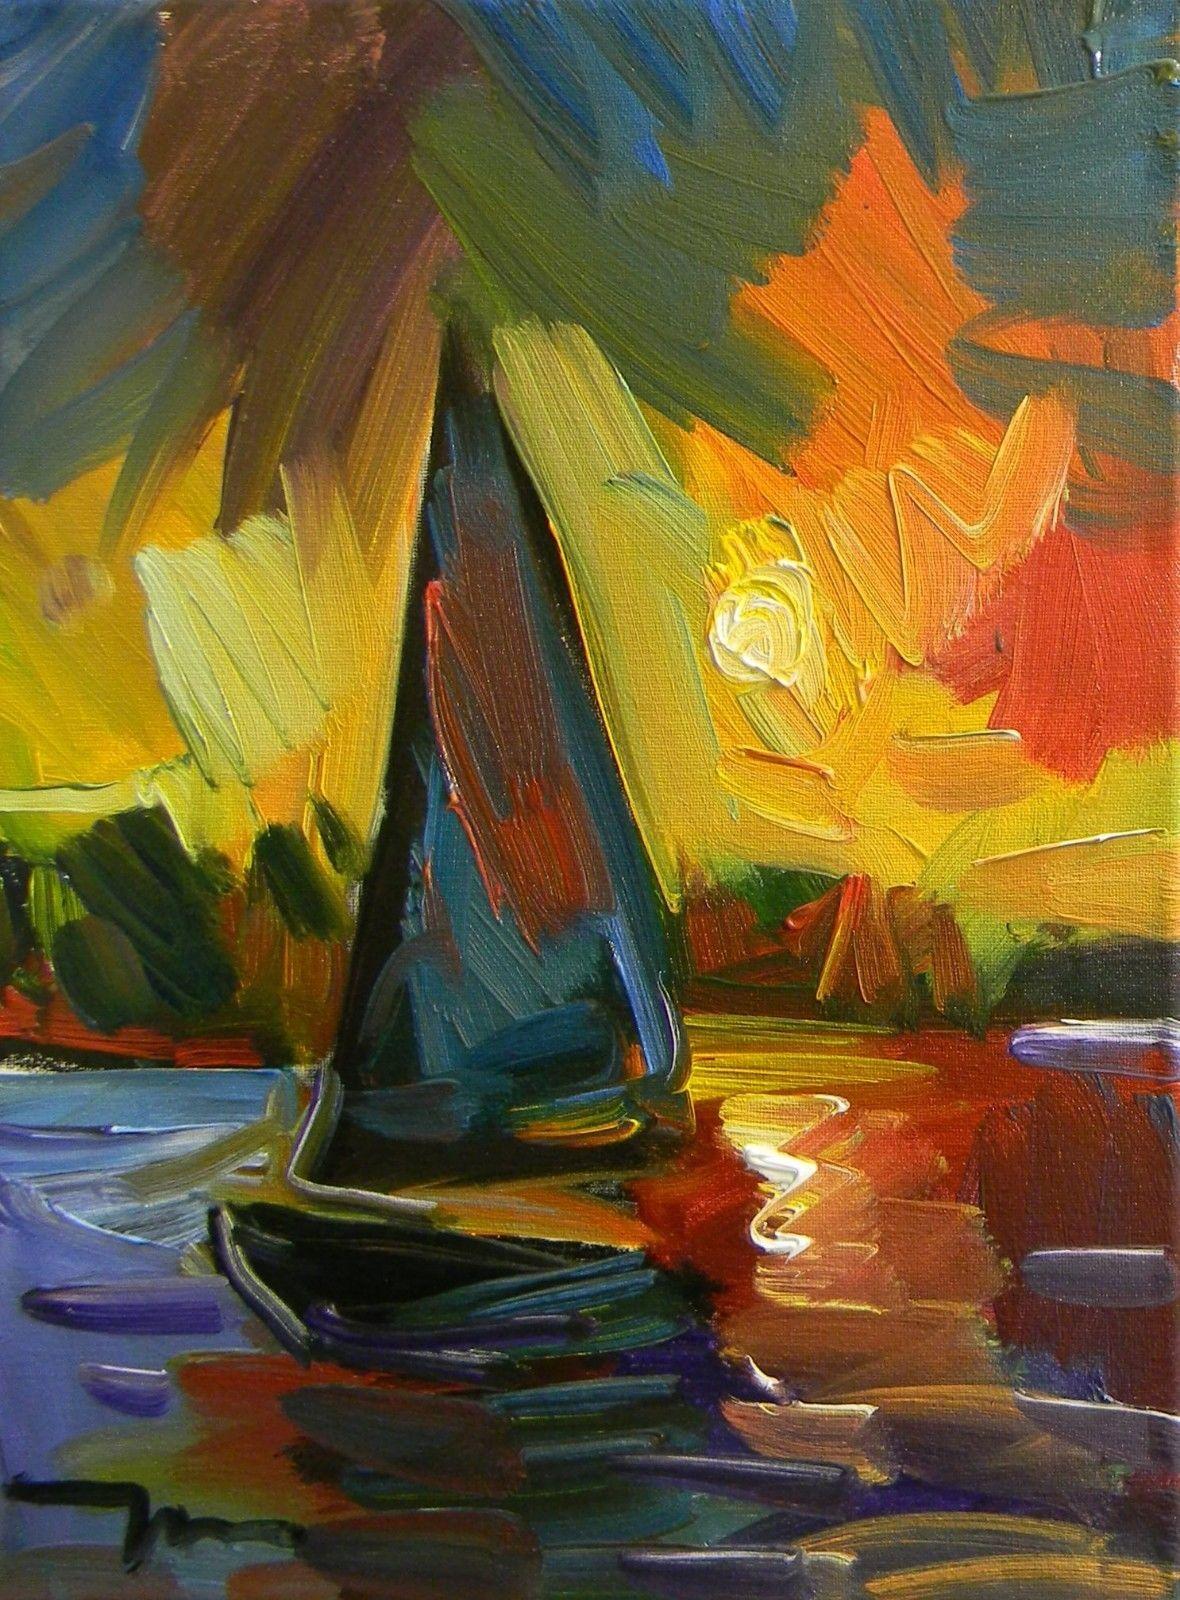 Jose trujillo oil painting sailboat sun sunset nautical wall art ...